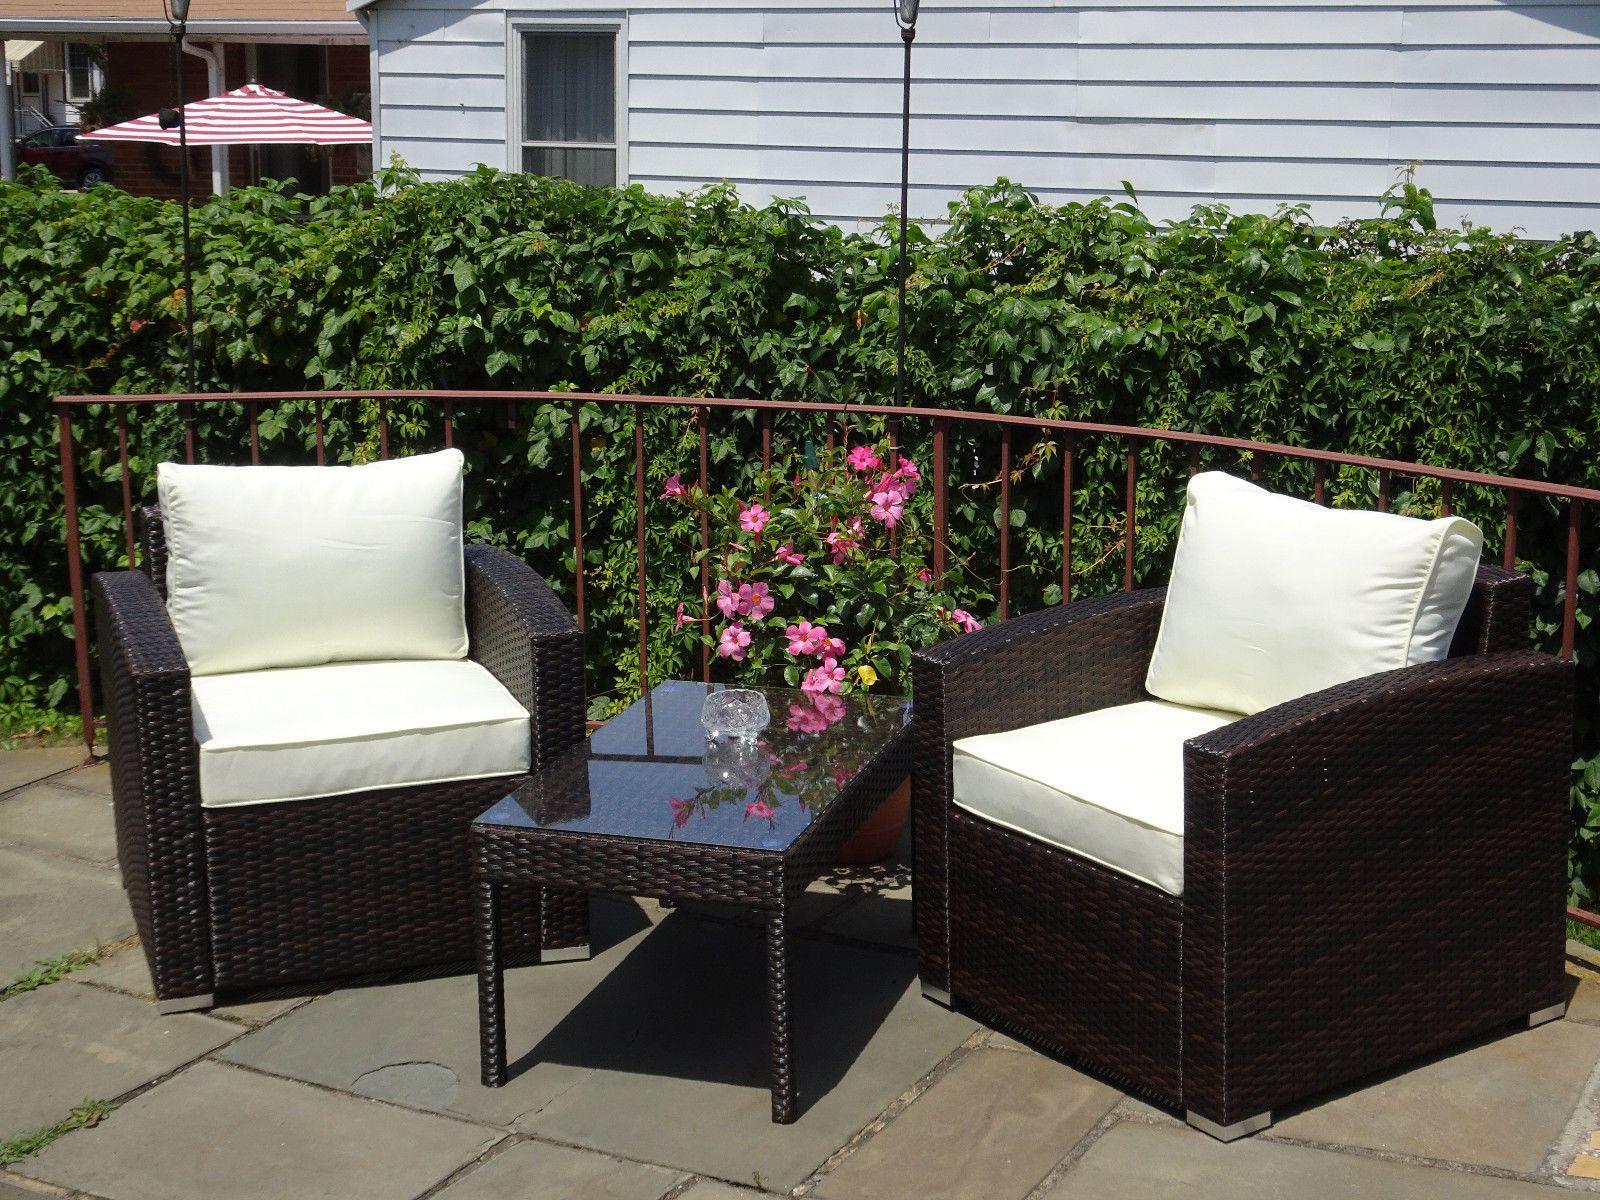 Furnitures Patio Resin Outdoor 3 Pc Wicker Lounge Set Dark Brown 2